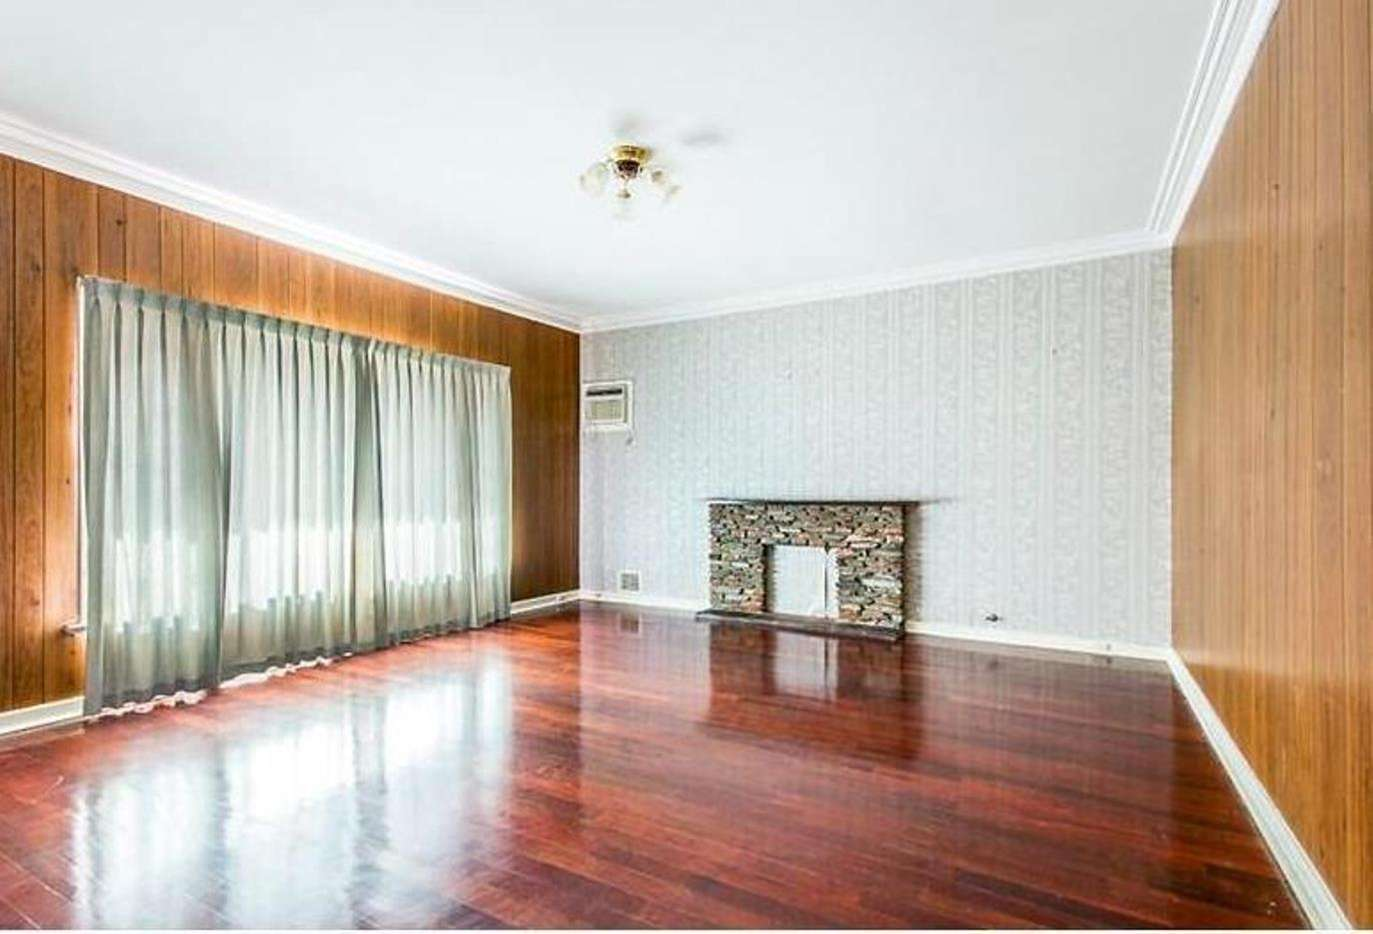 Main view of Homely house listing, 5 Forward Street, Mandurah, WA 6210